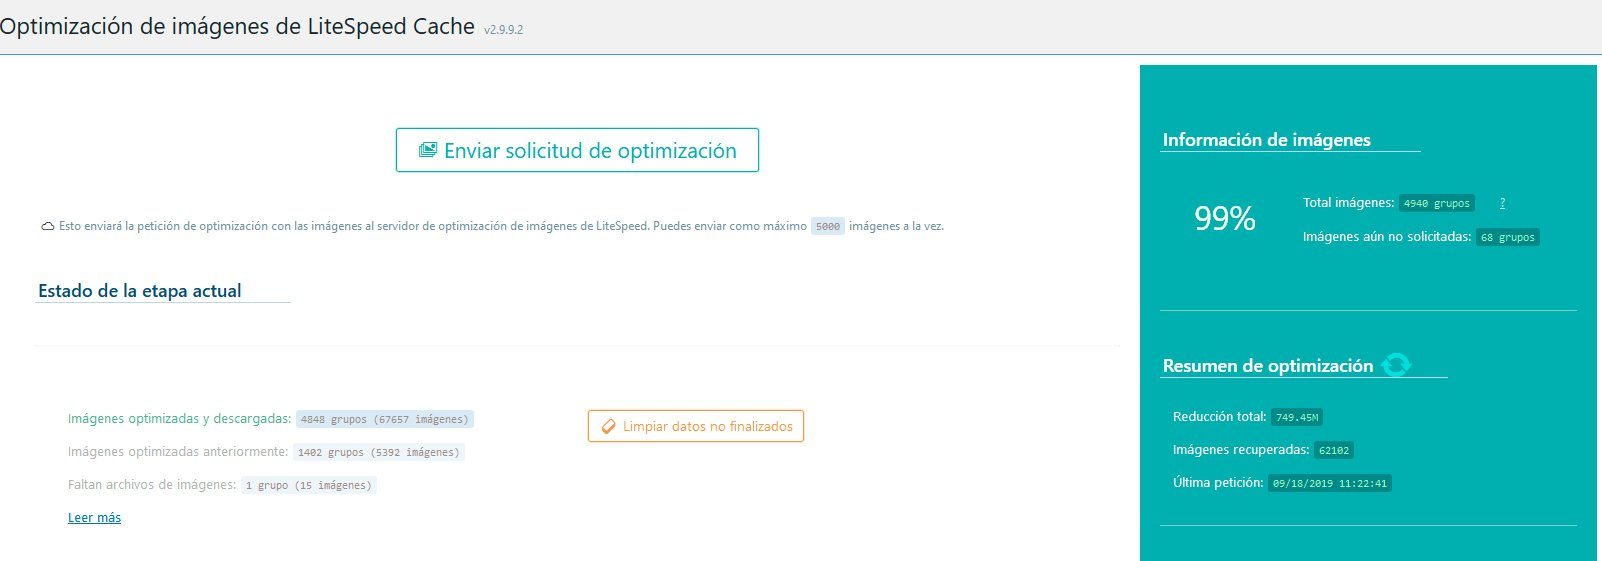 optimizador-de-imágenes-de-LiteSpeed